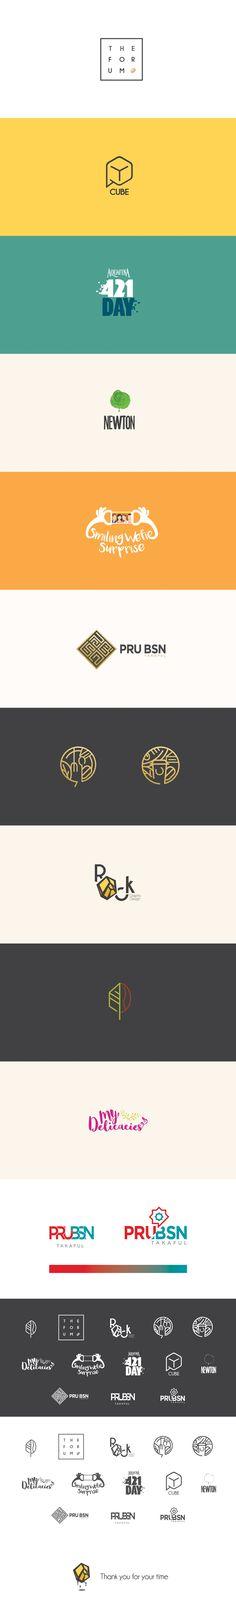 Logos Design by Benny Yap